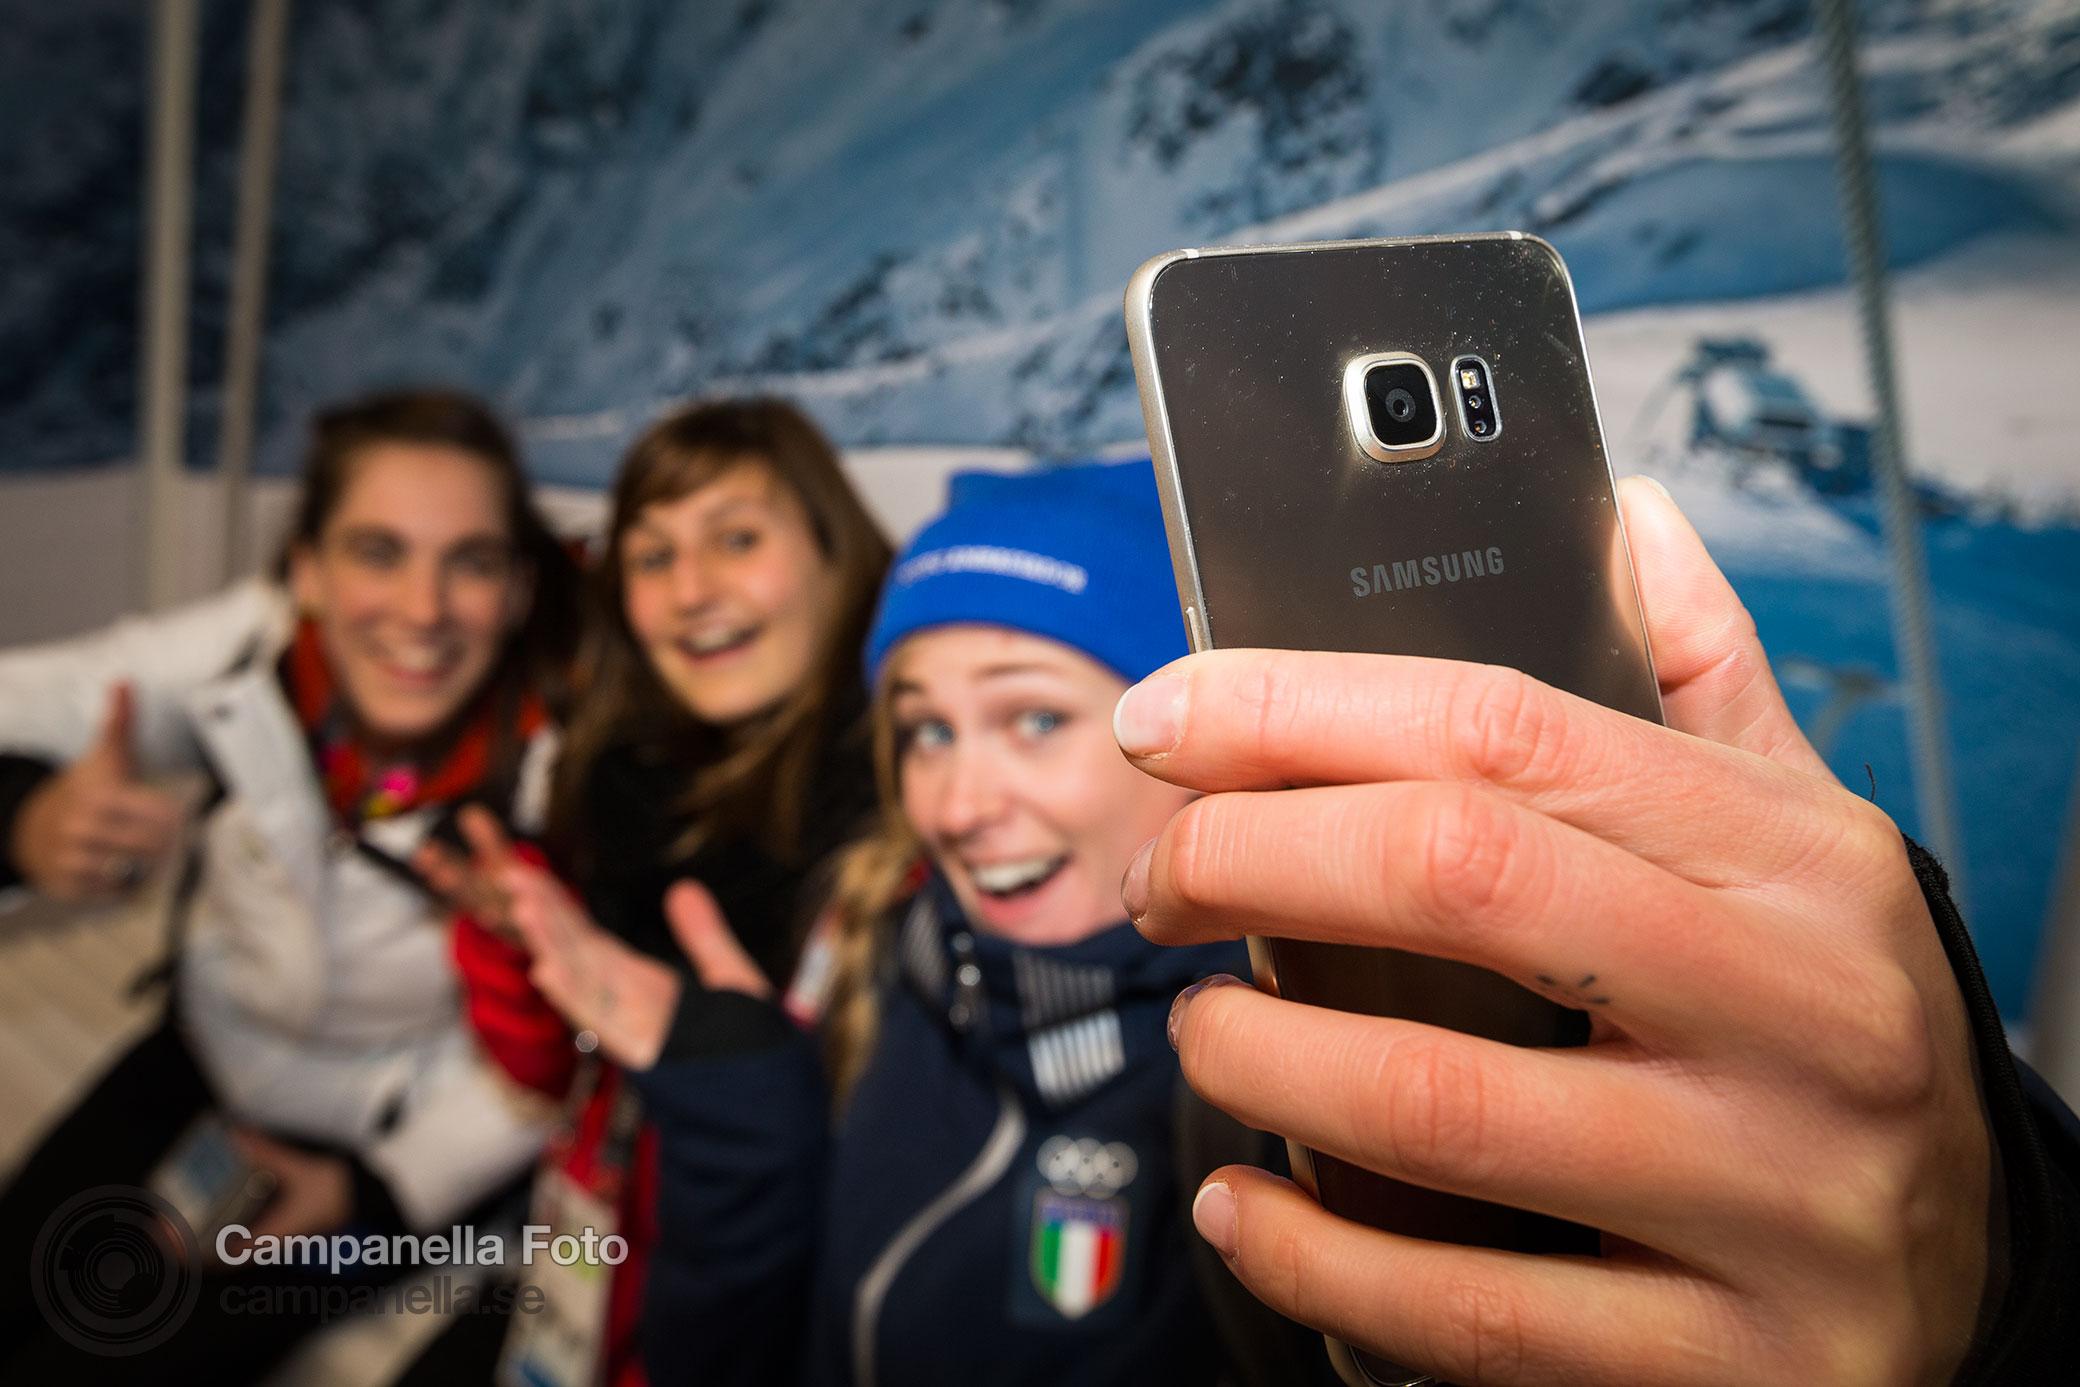 PR Photography for Samsung - Michael Campanella Photography